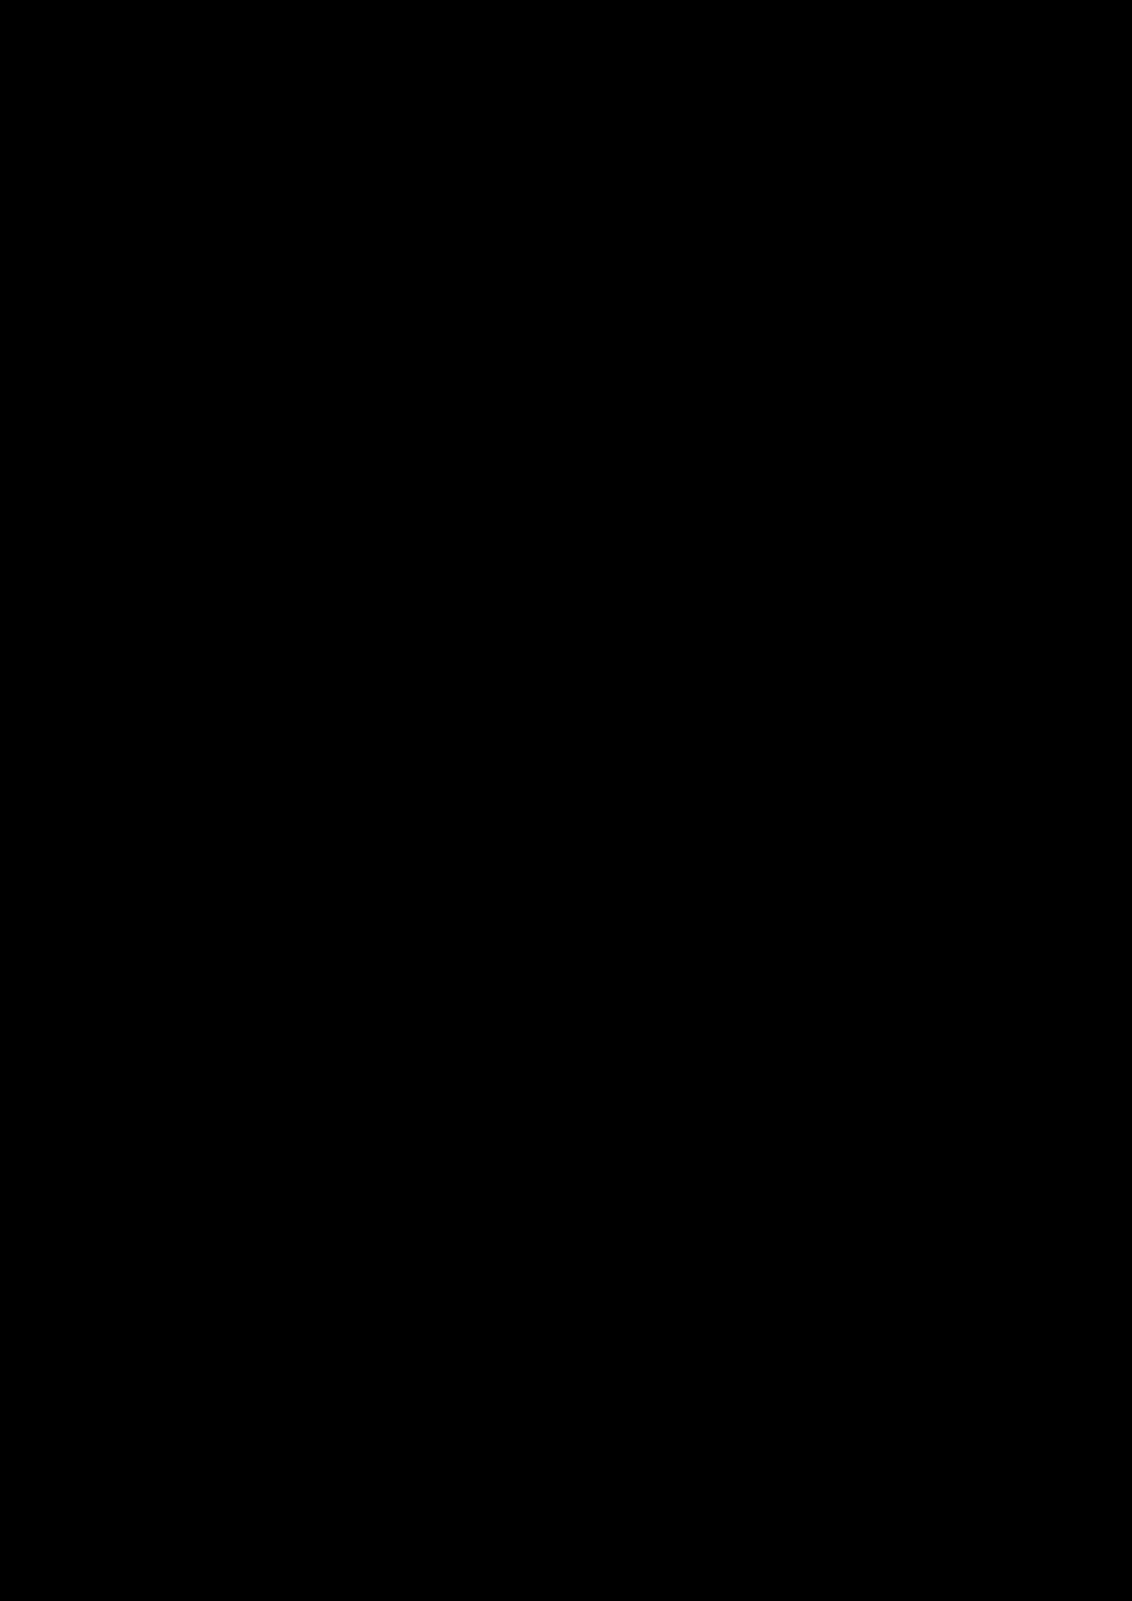 Prosti slide, Image 16